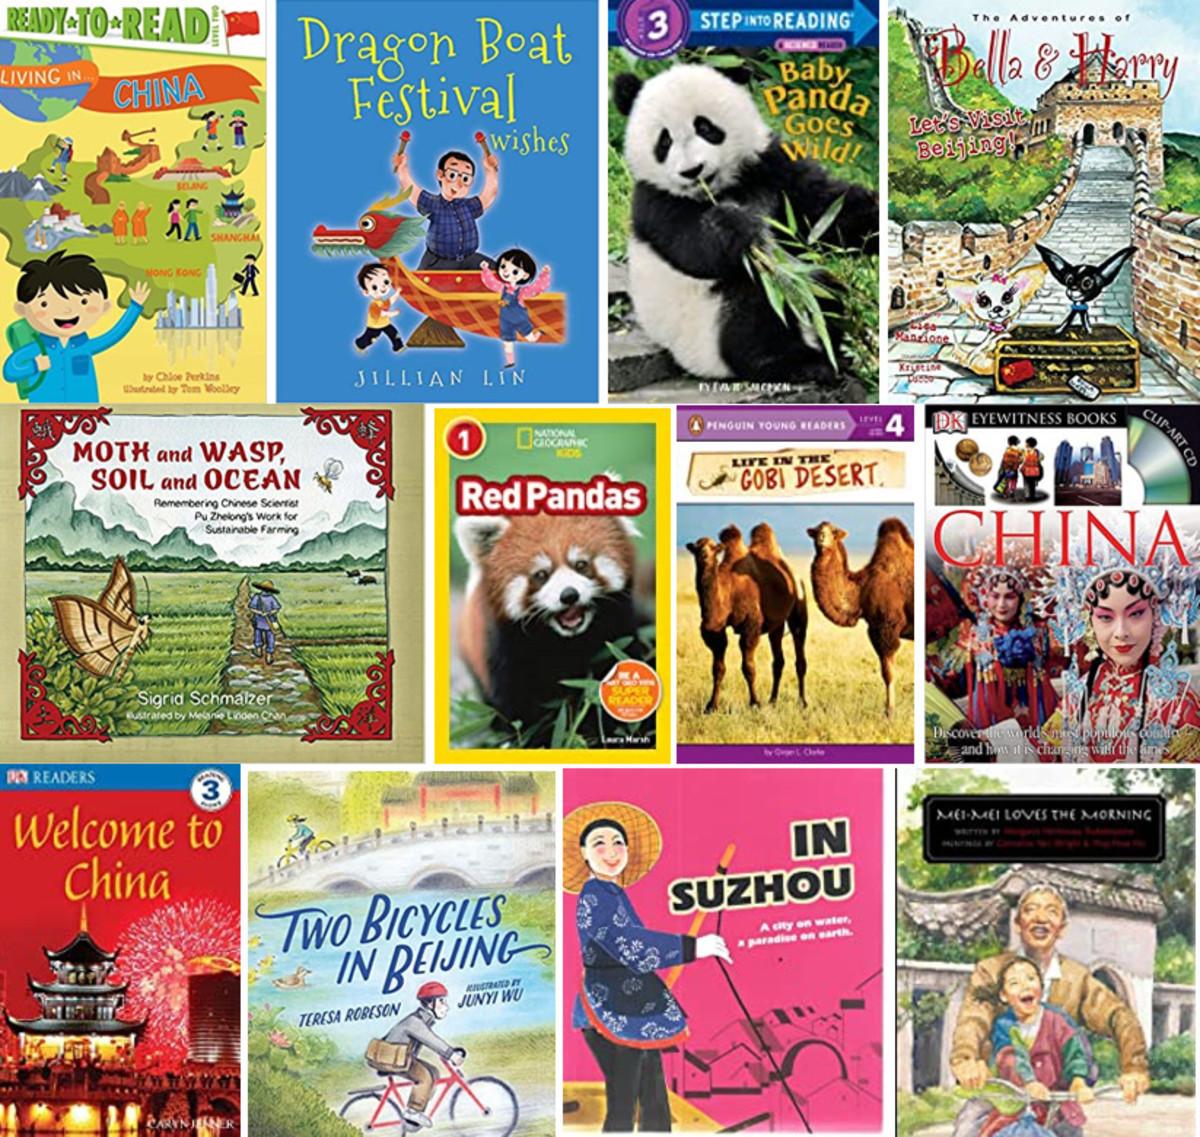 Best Children's Books List on Modern China